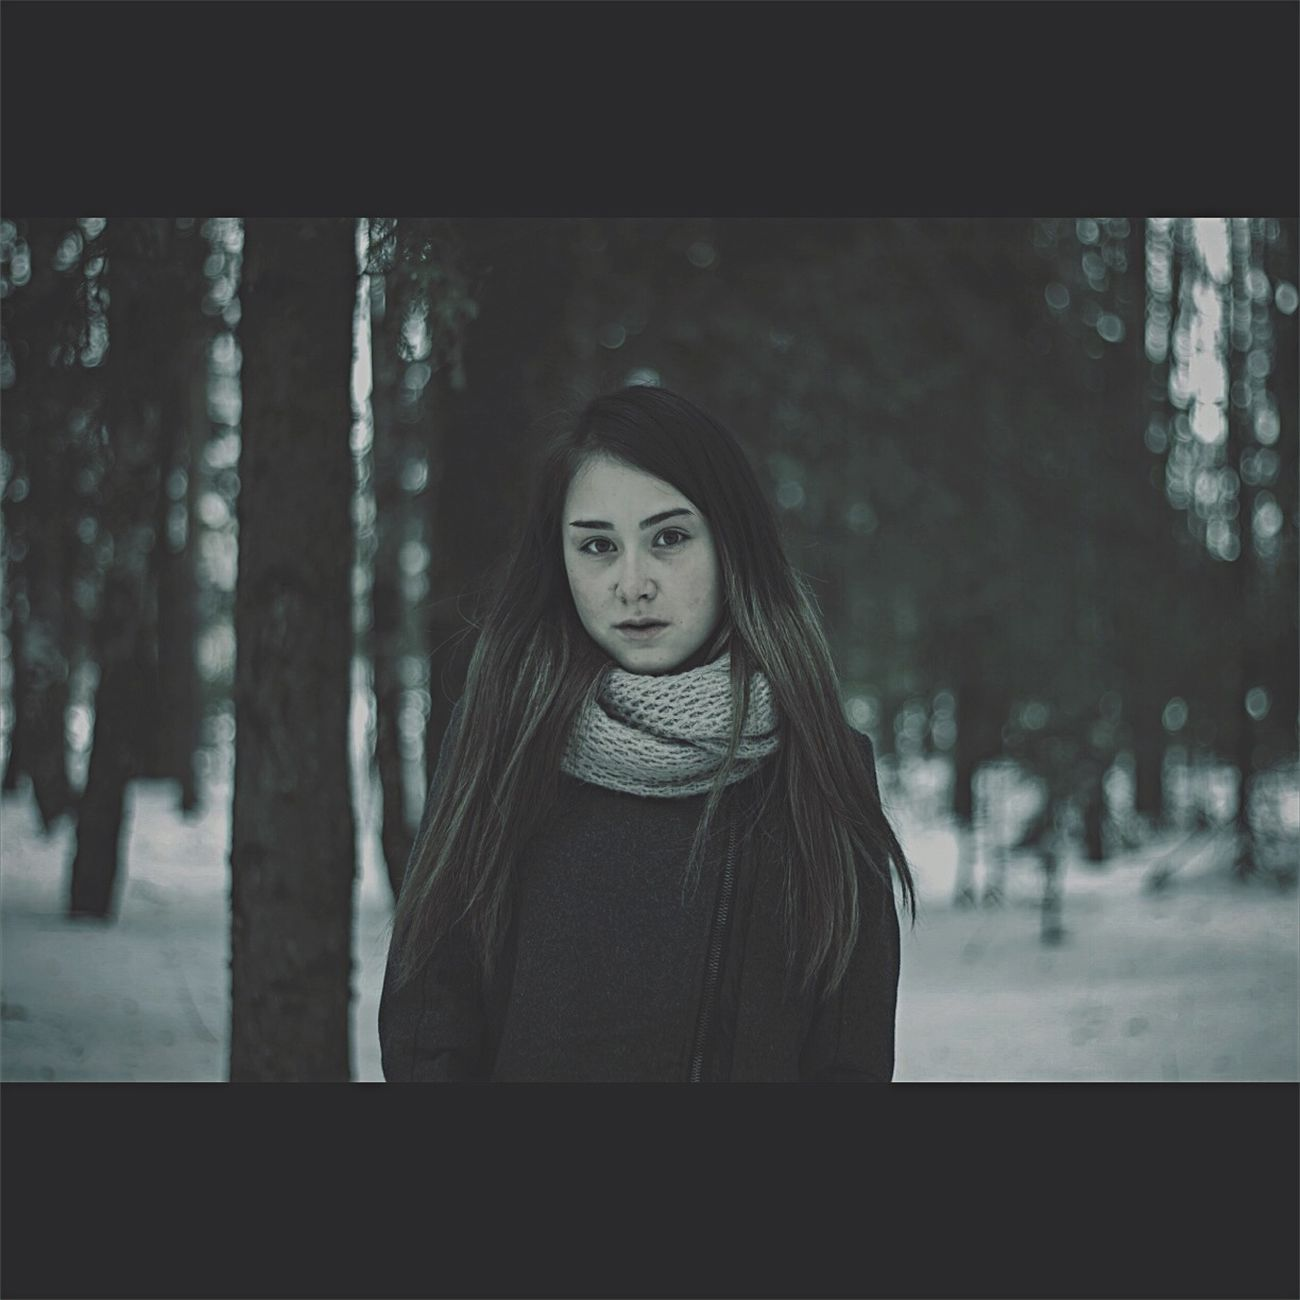 Taking Photos Like лакшерилайф Fallowme Лес🙈